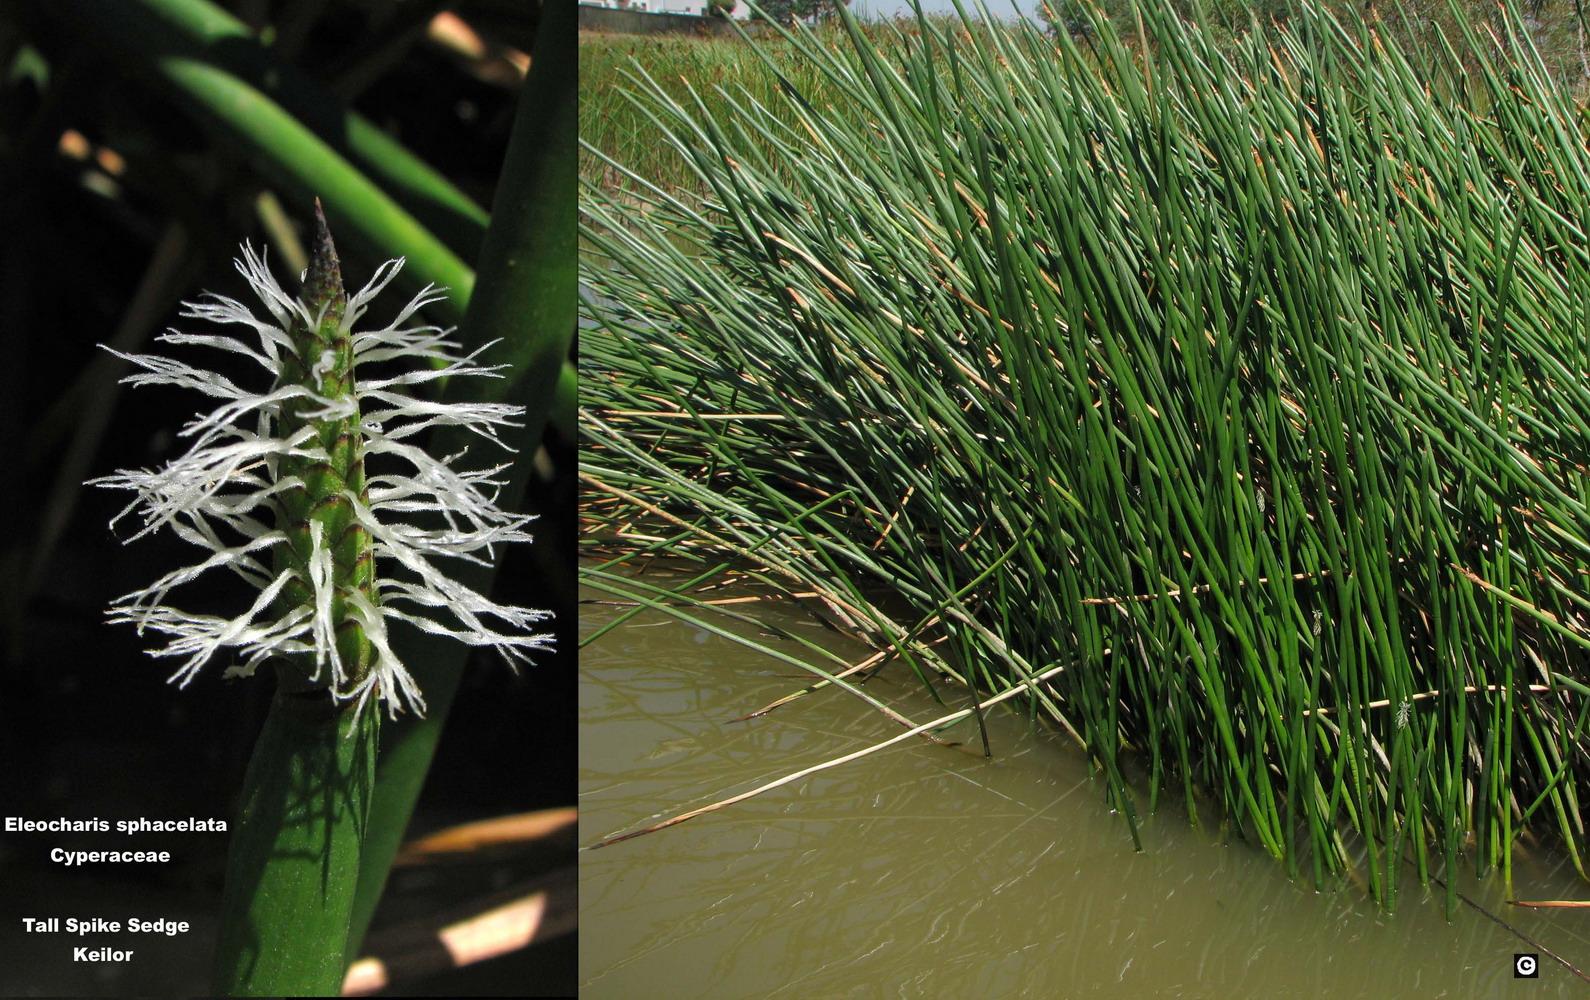 Eleocharis sphacelata flora ALA source